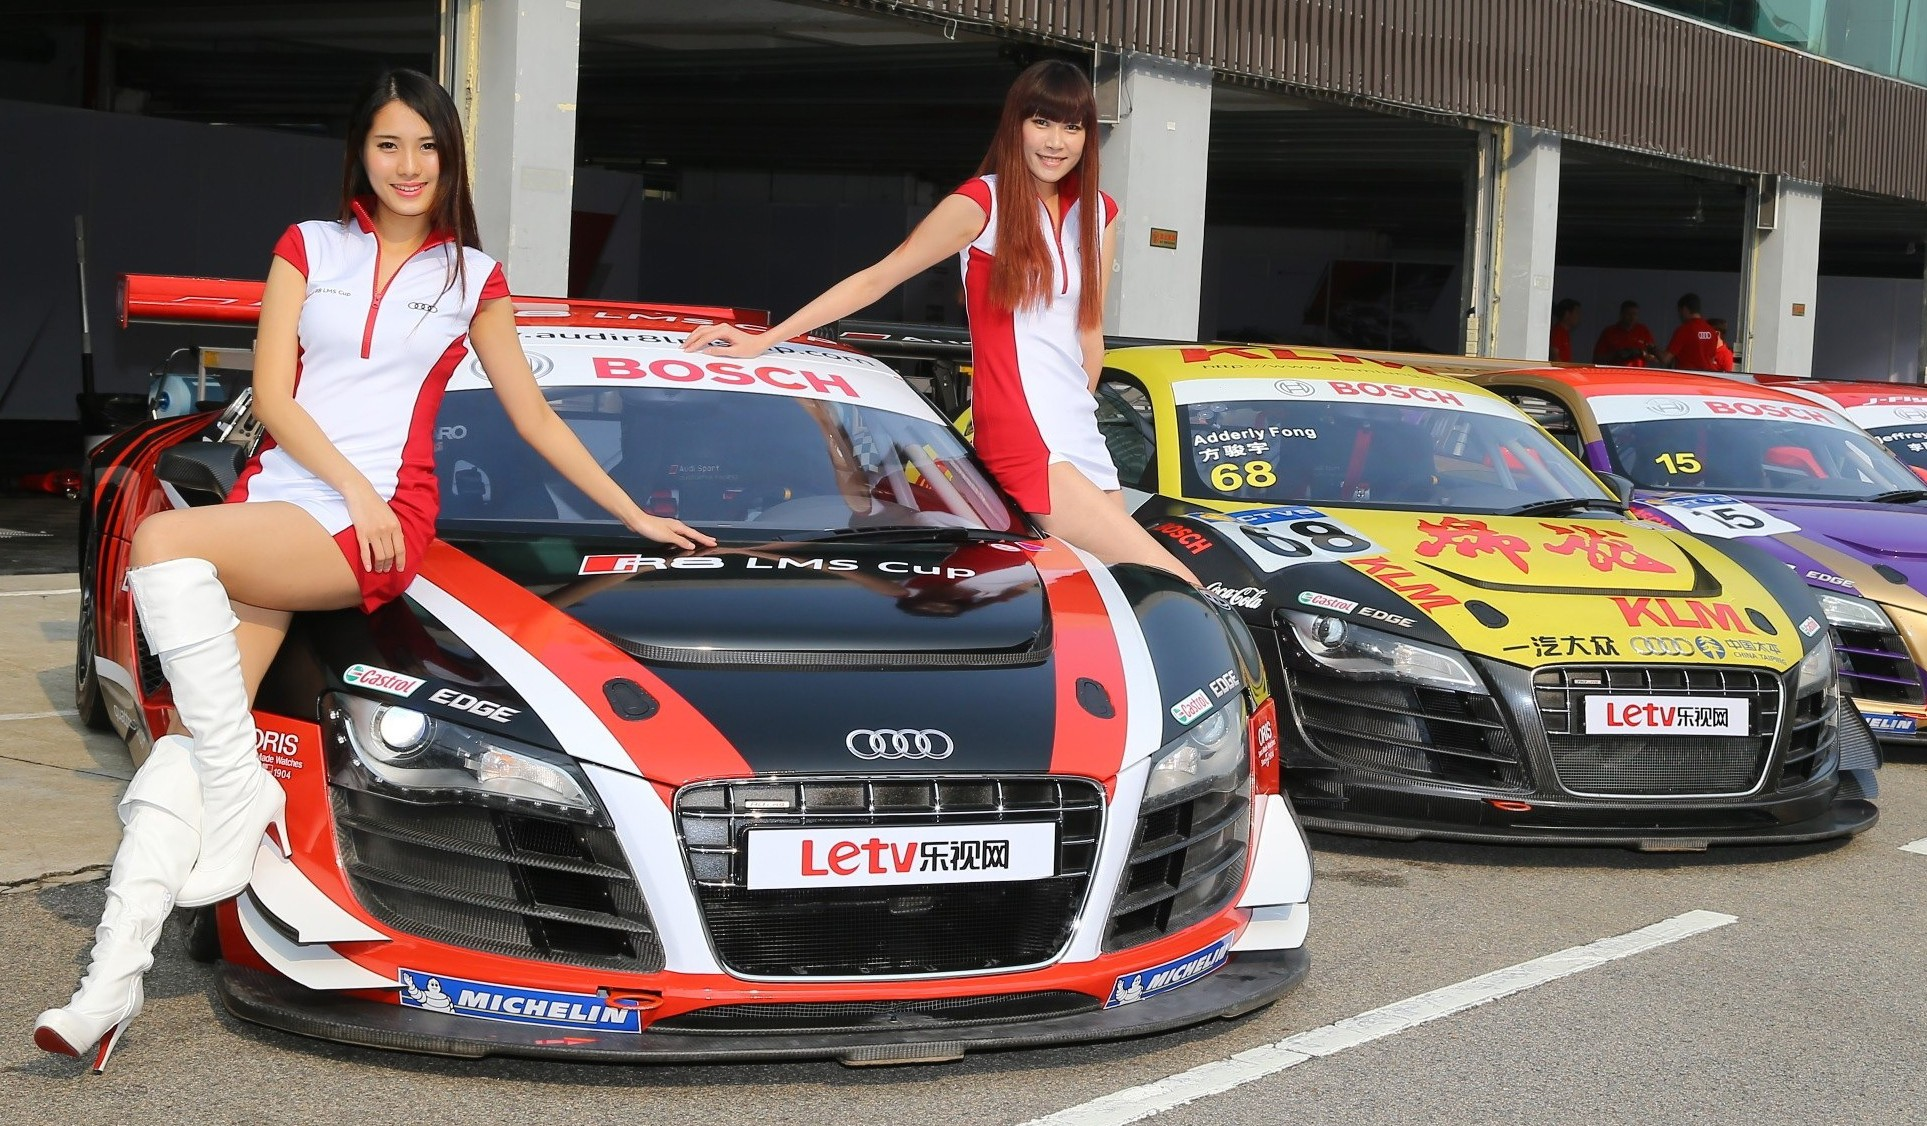 Kl City Grand Prix V8 Supercars Audi R8 Lms Cup